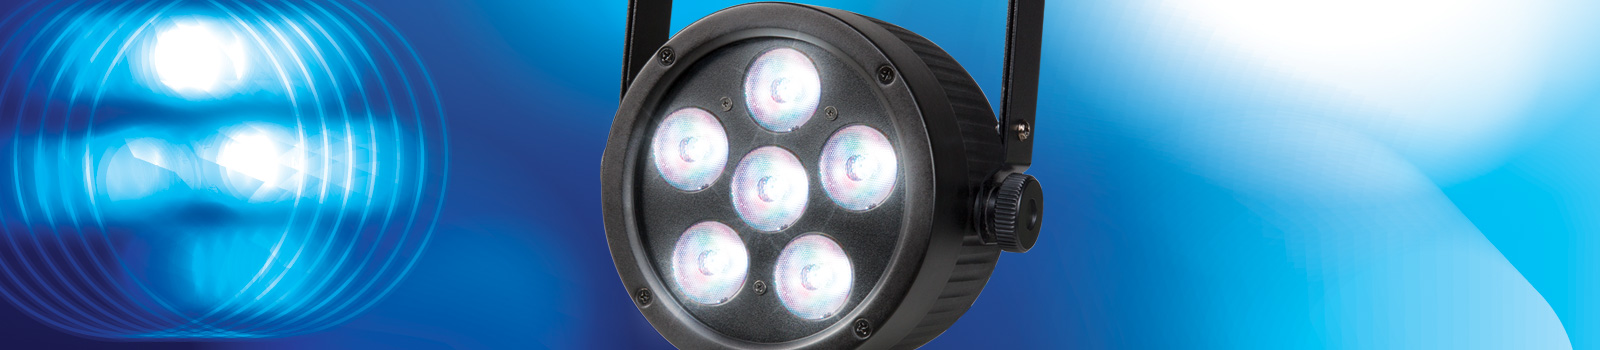 ThinTri38 Venue Lighting Effects